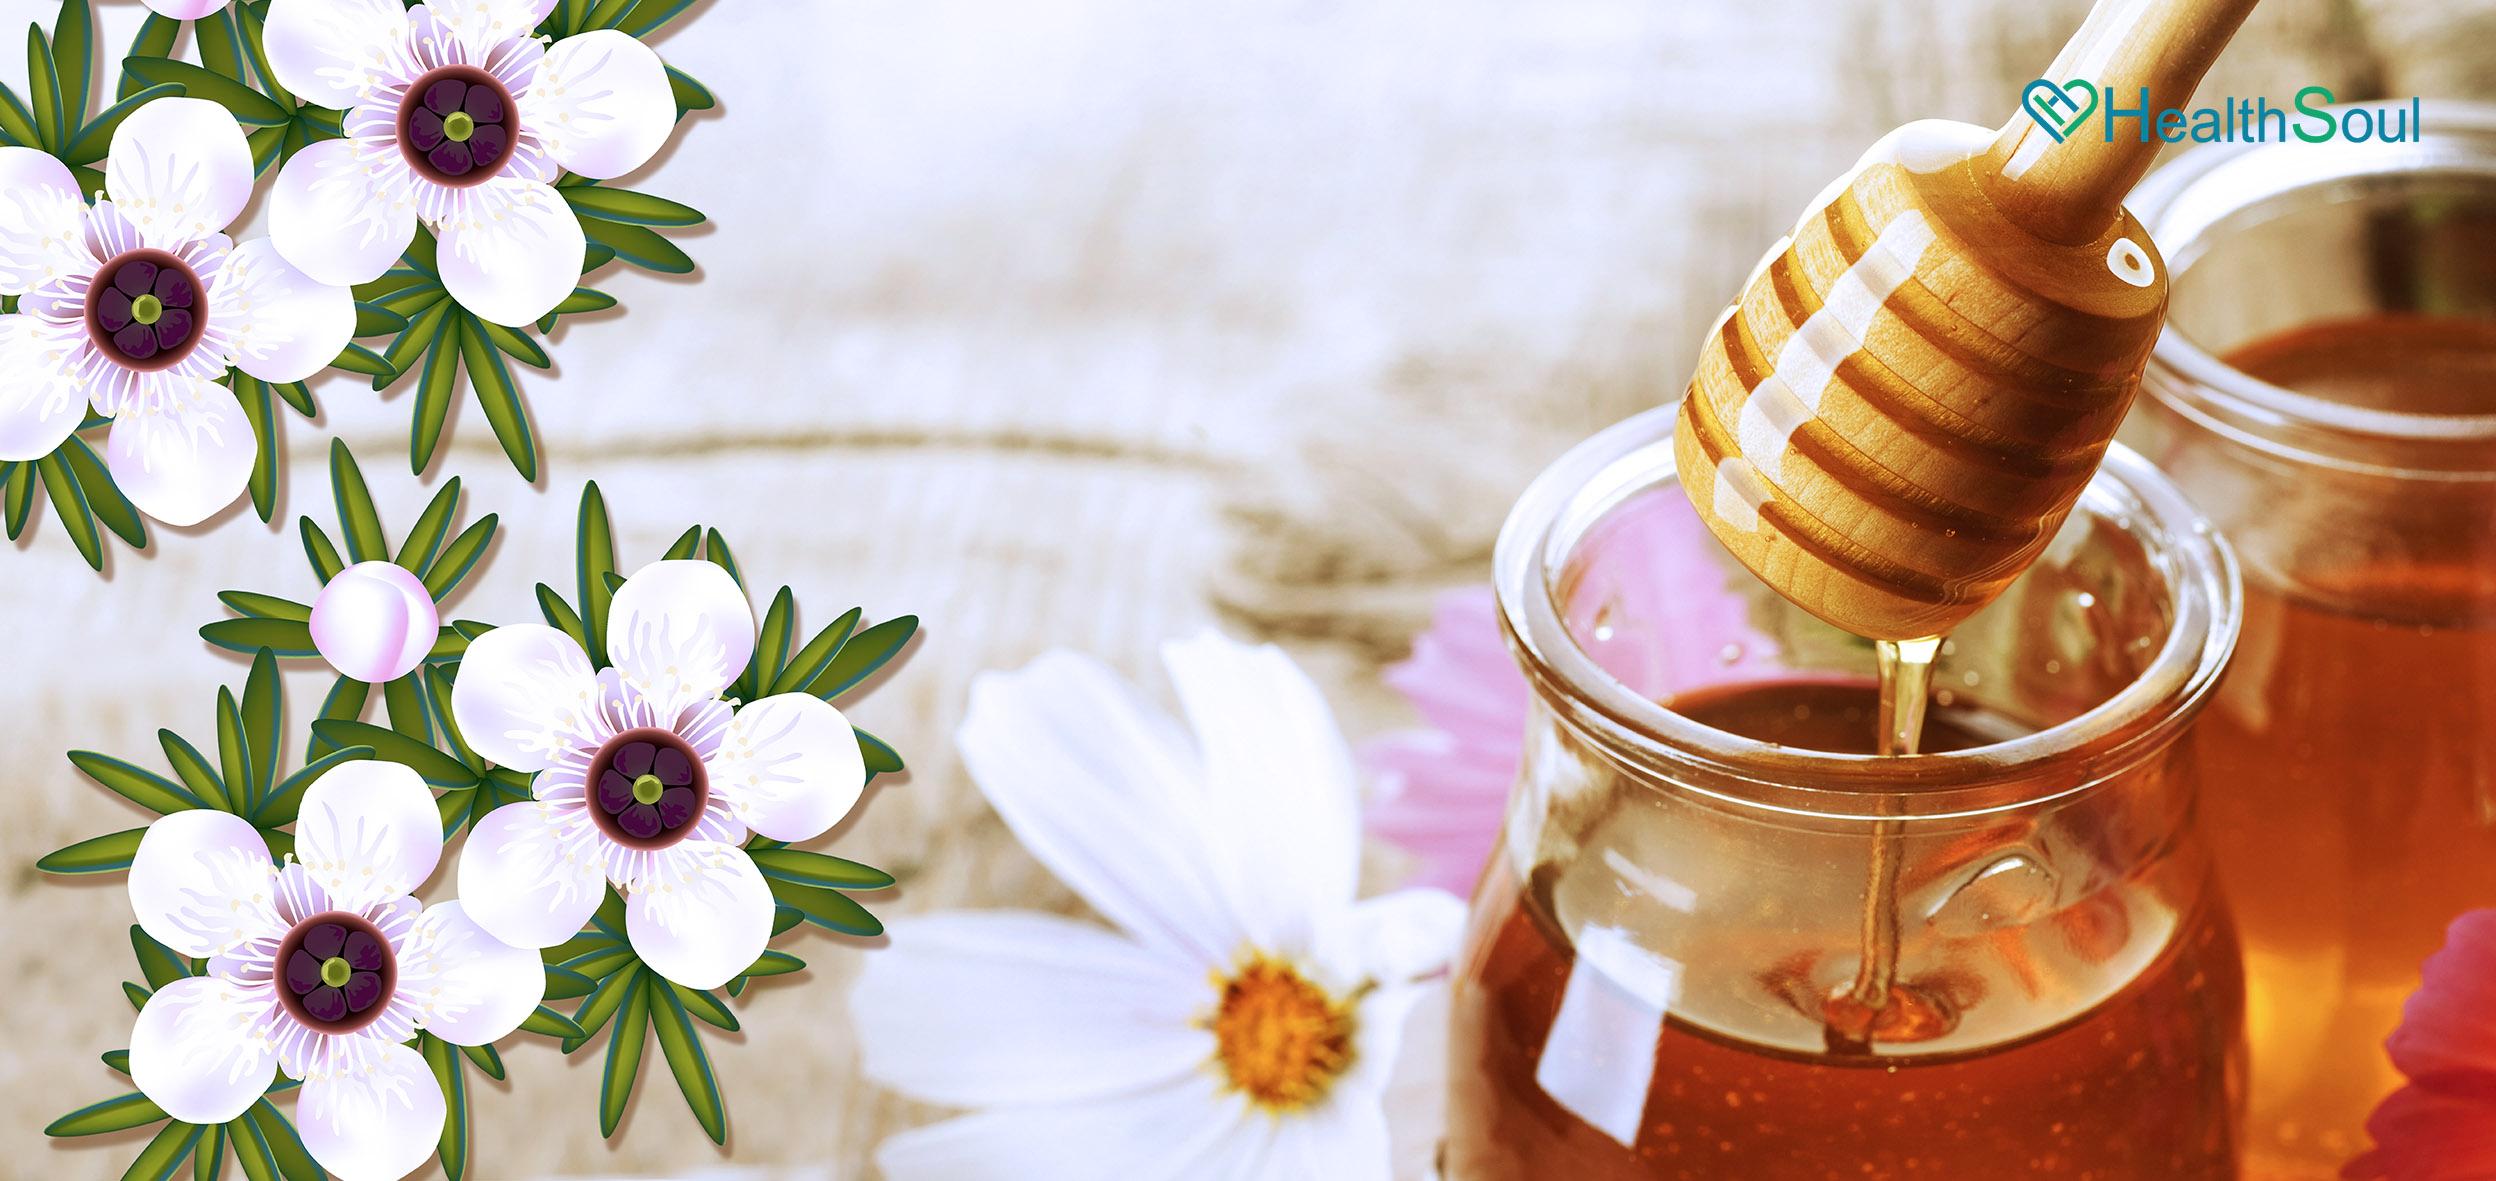 4 reasons to enjoy manuka honey | HealthSoul